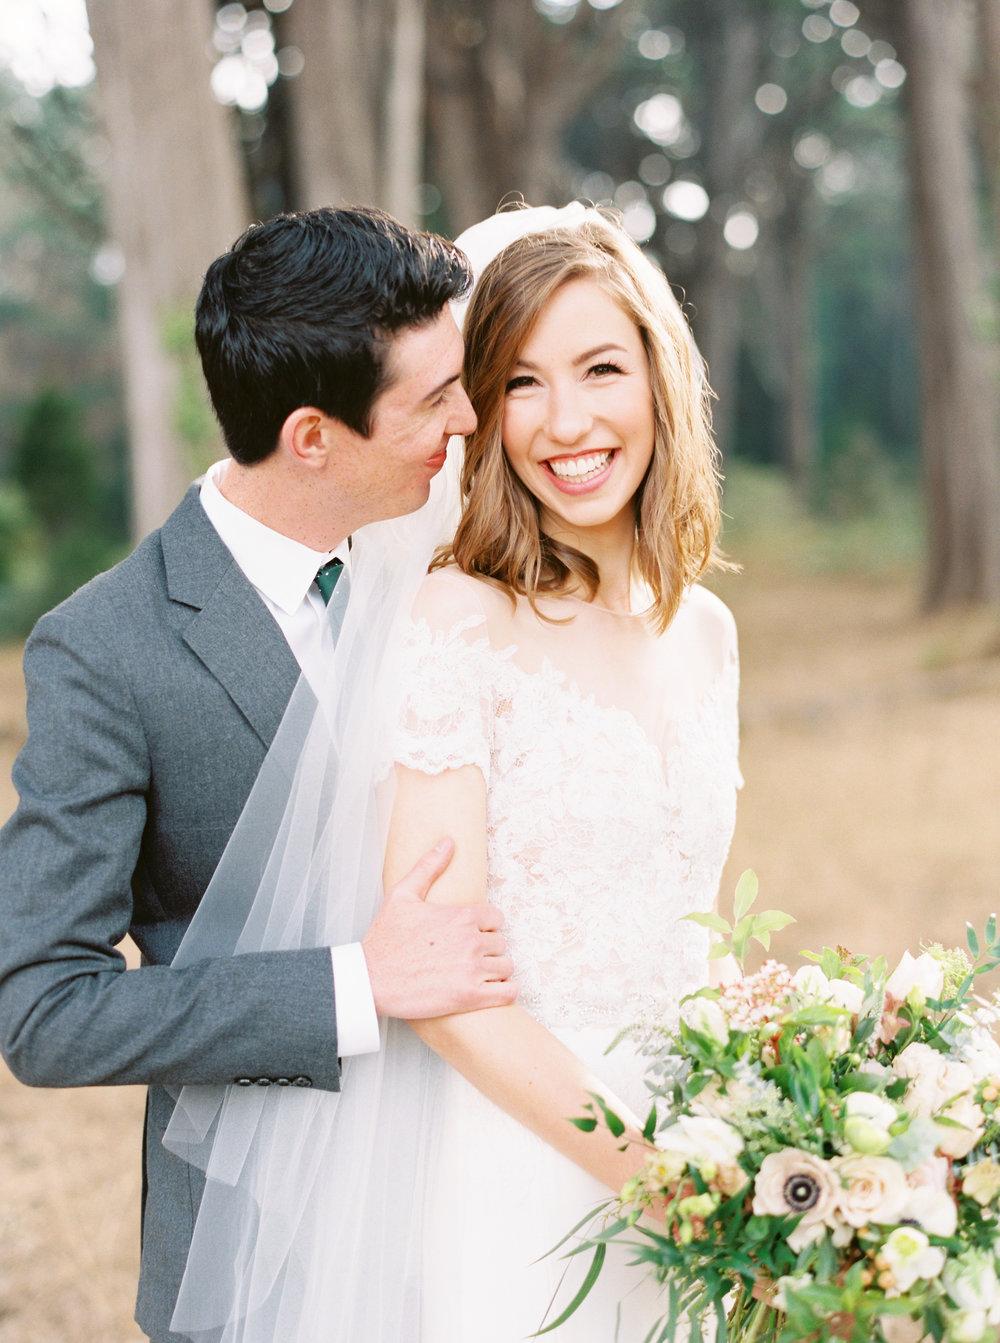 Log-cabin-wedding-in-presidio-san-francisco-california-desintation-wedding-photography-86.jpg